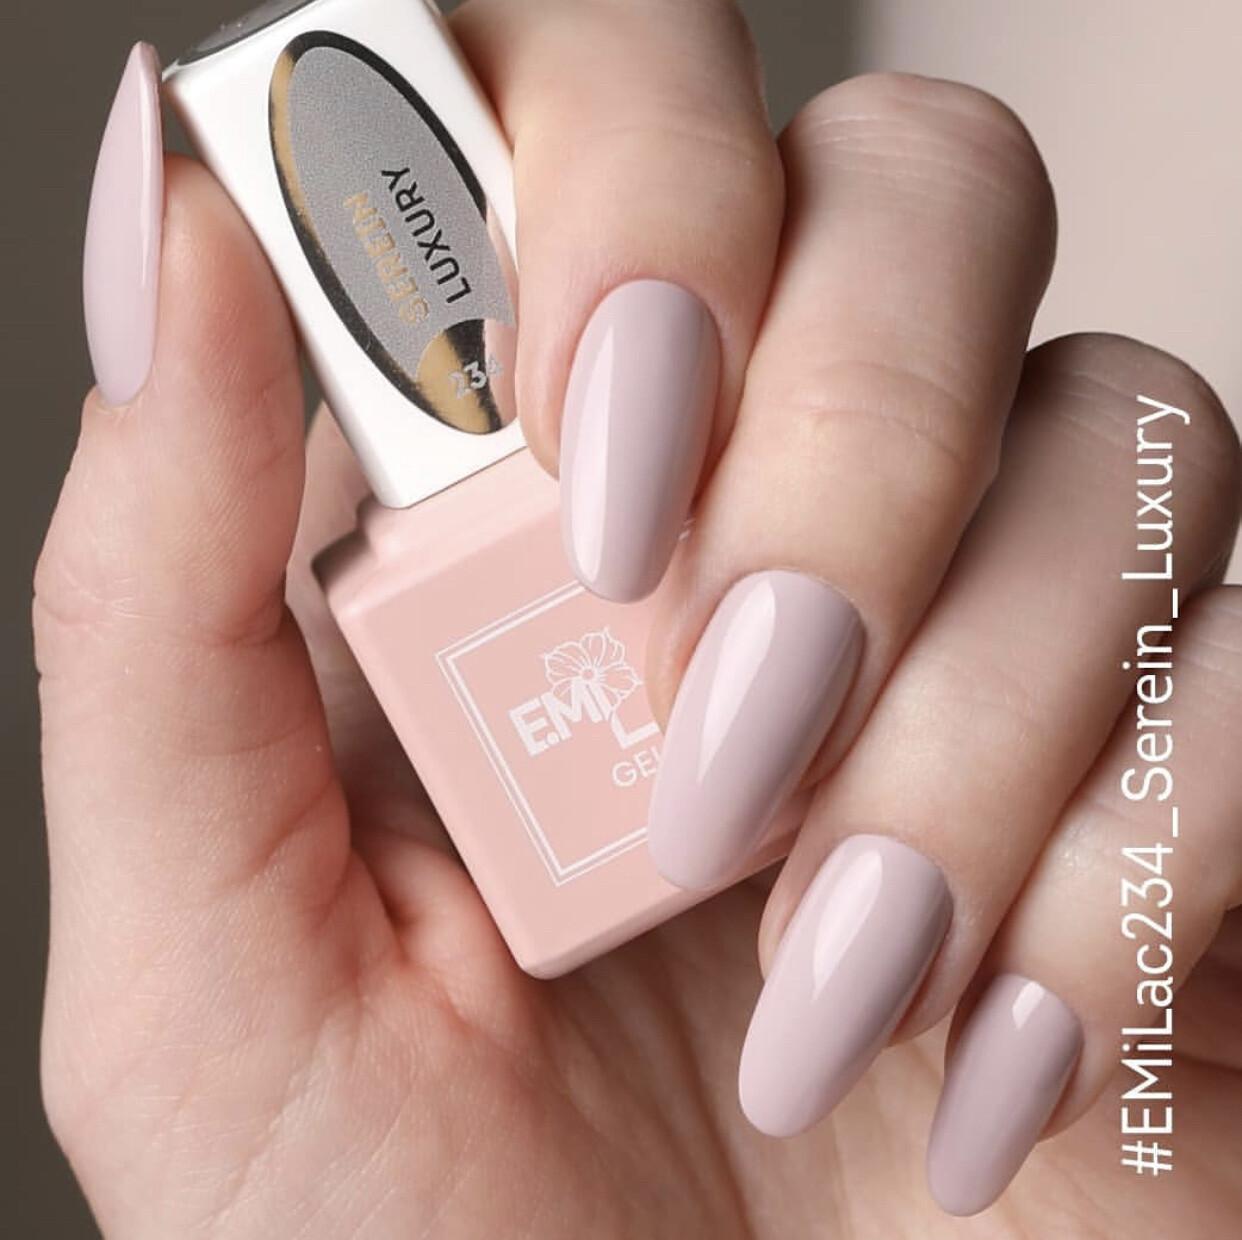 E.MiLac LM Serein Luxury #234, 9 ml.